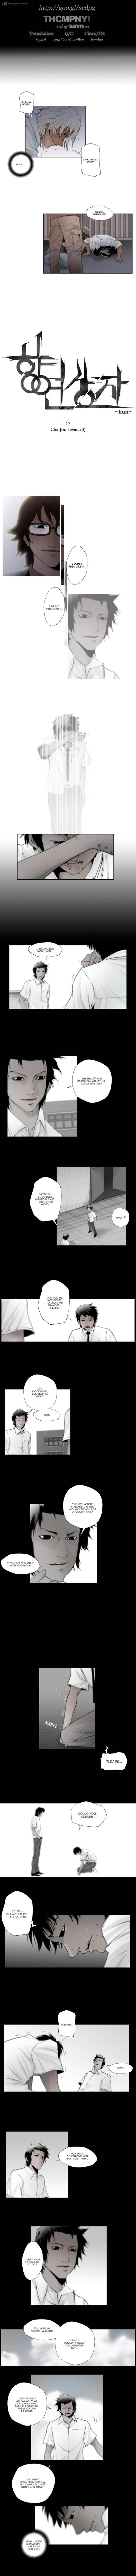 Banquet Box 17 Page 1